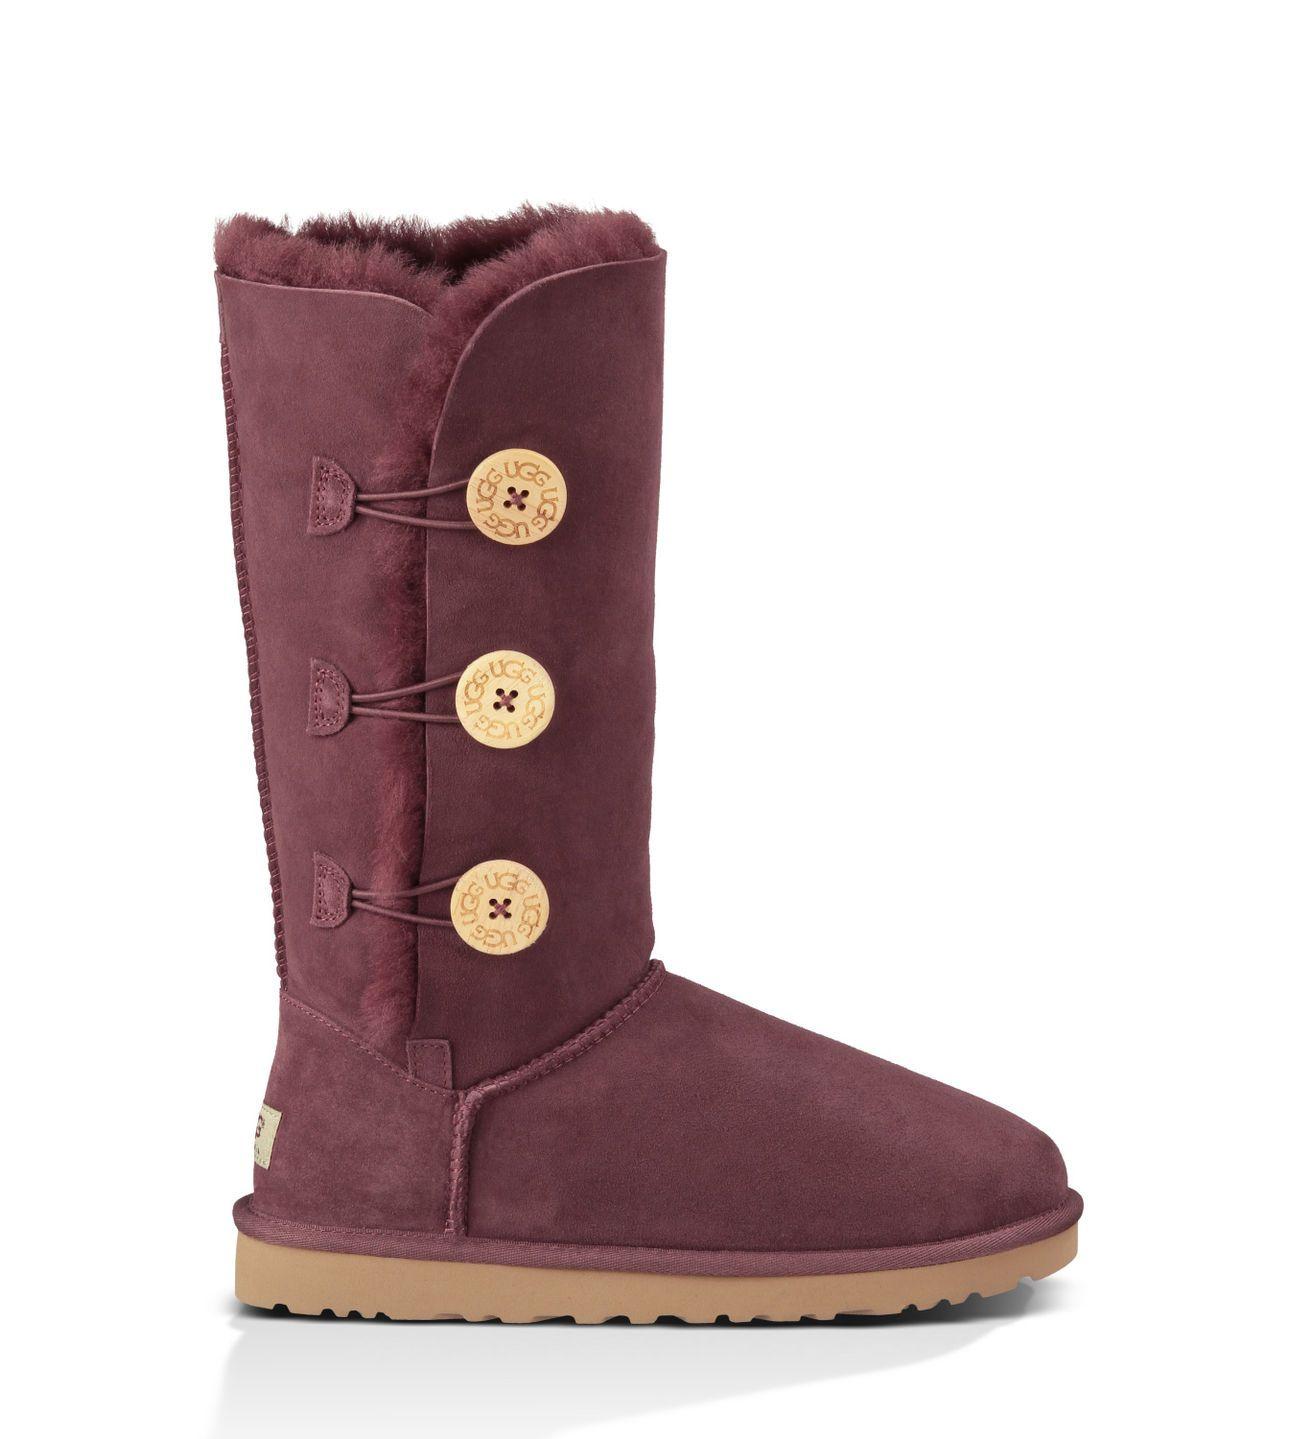 59242a58c45 denmark ugg bailey button triplet womens boots black head 73b1a 78424